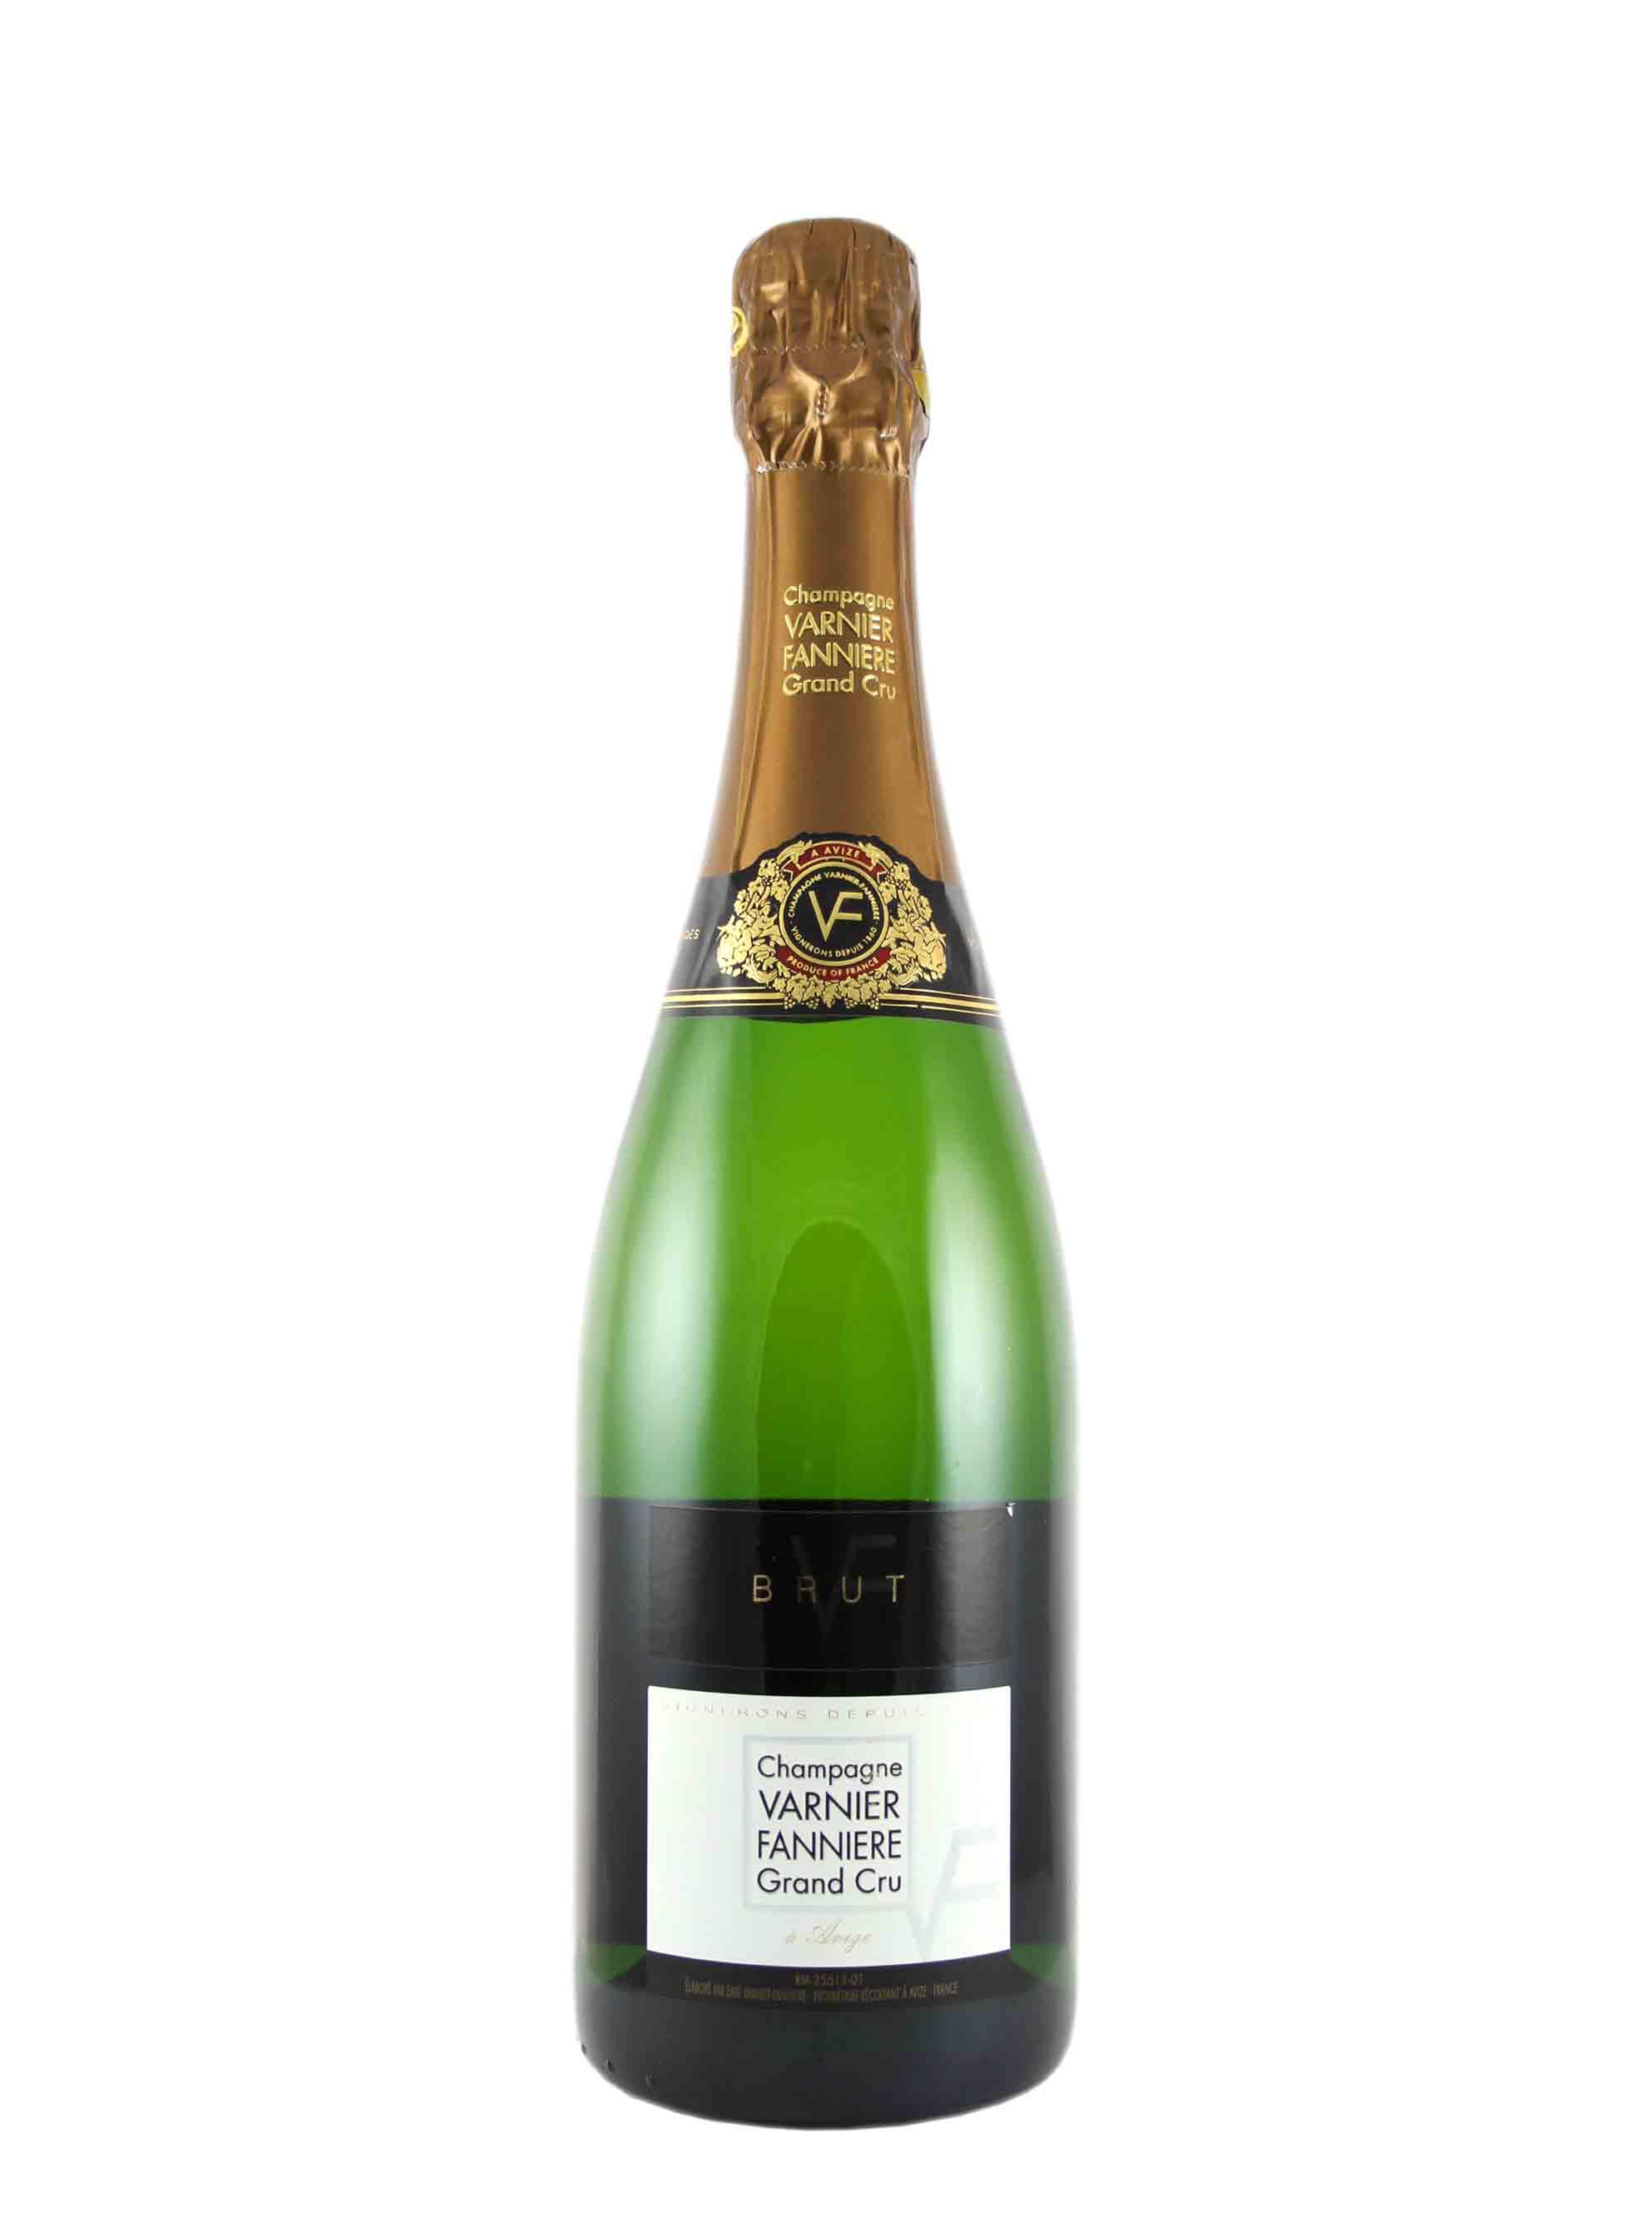 Chardonnay, Grand Cru Classé, Varnier - Fanniere, 0.75 l